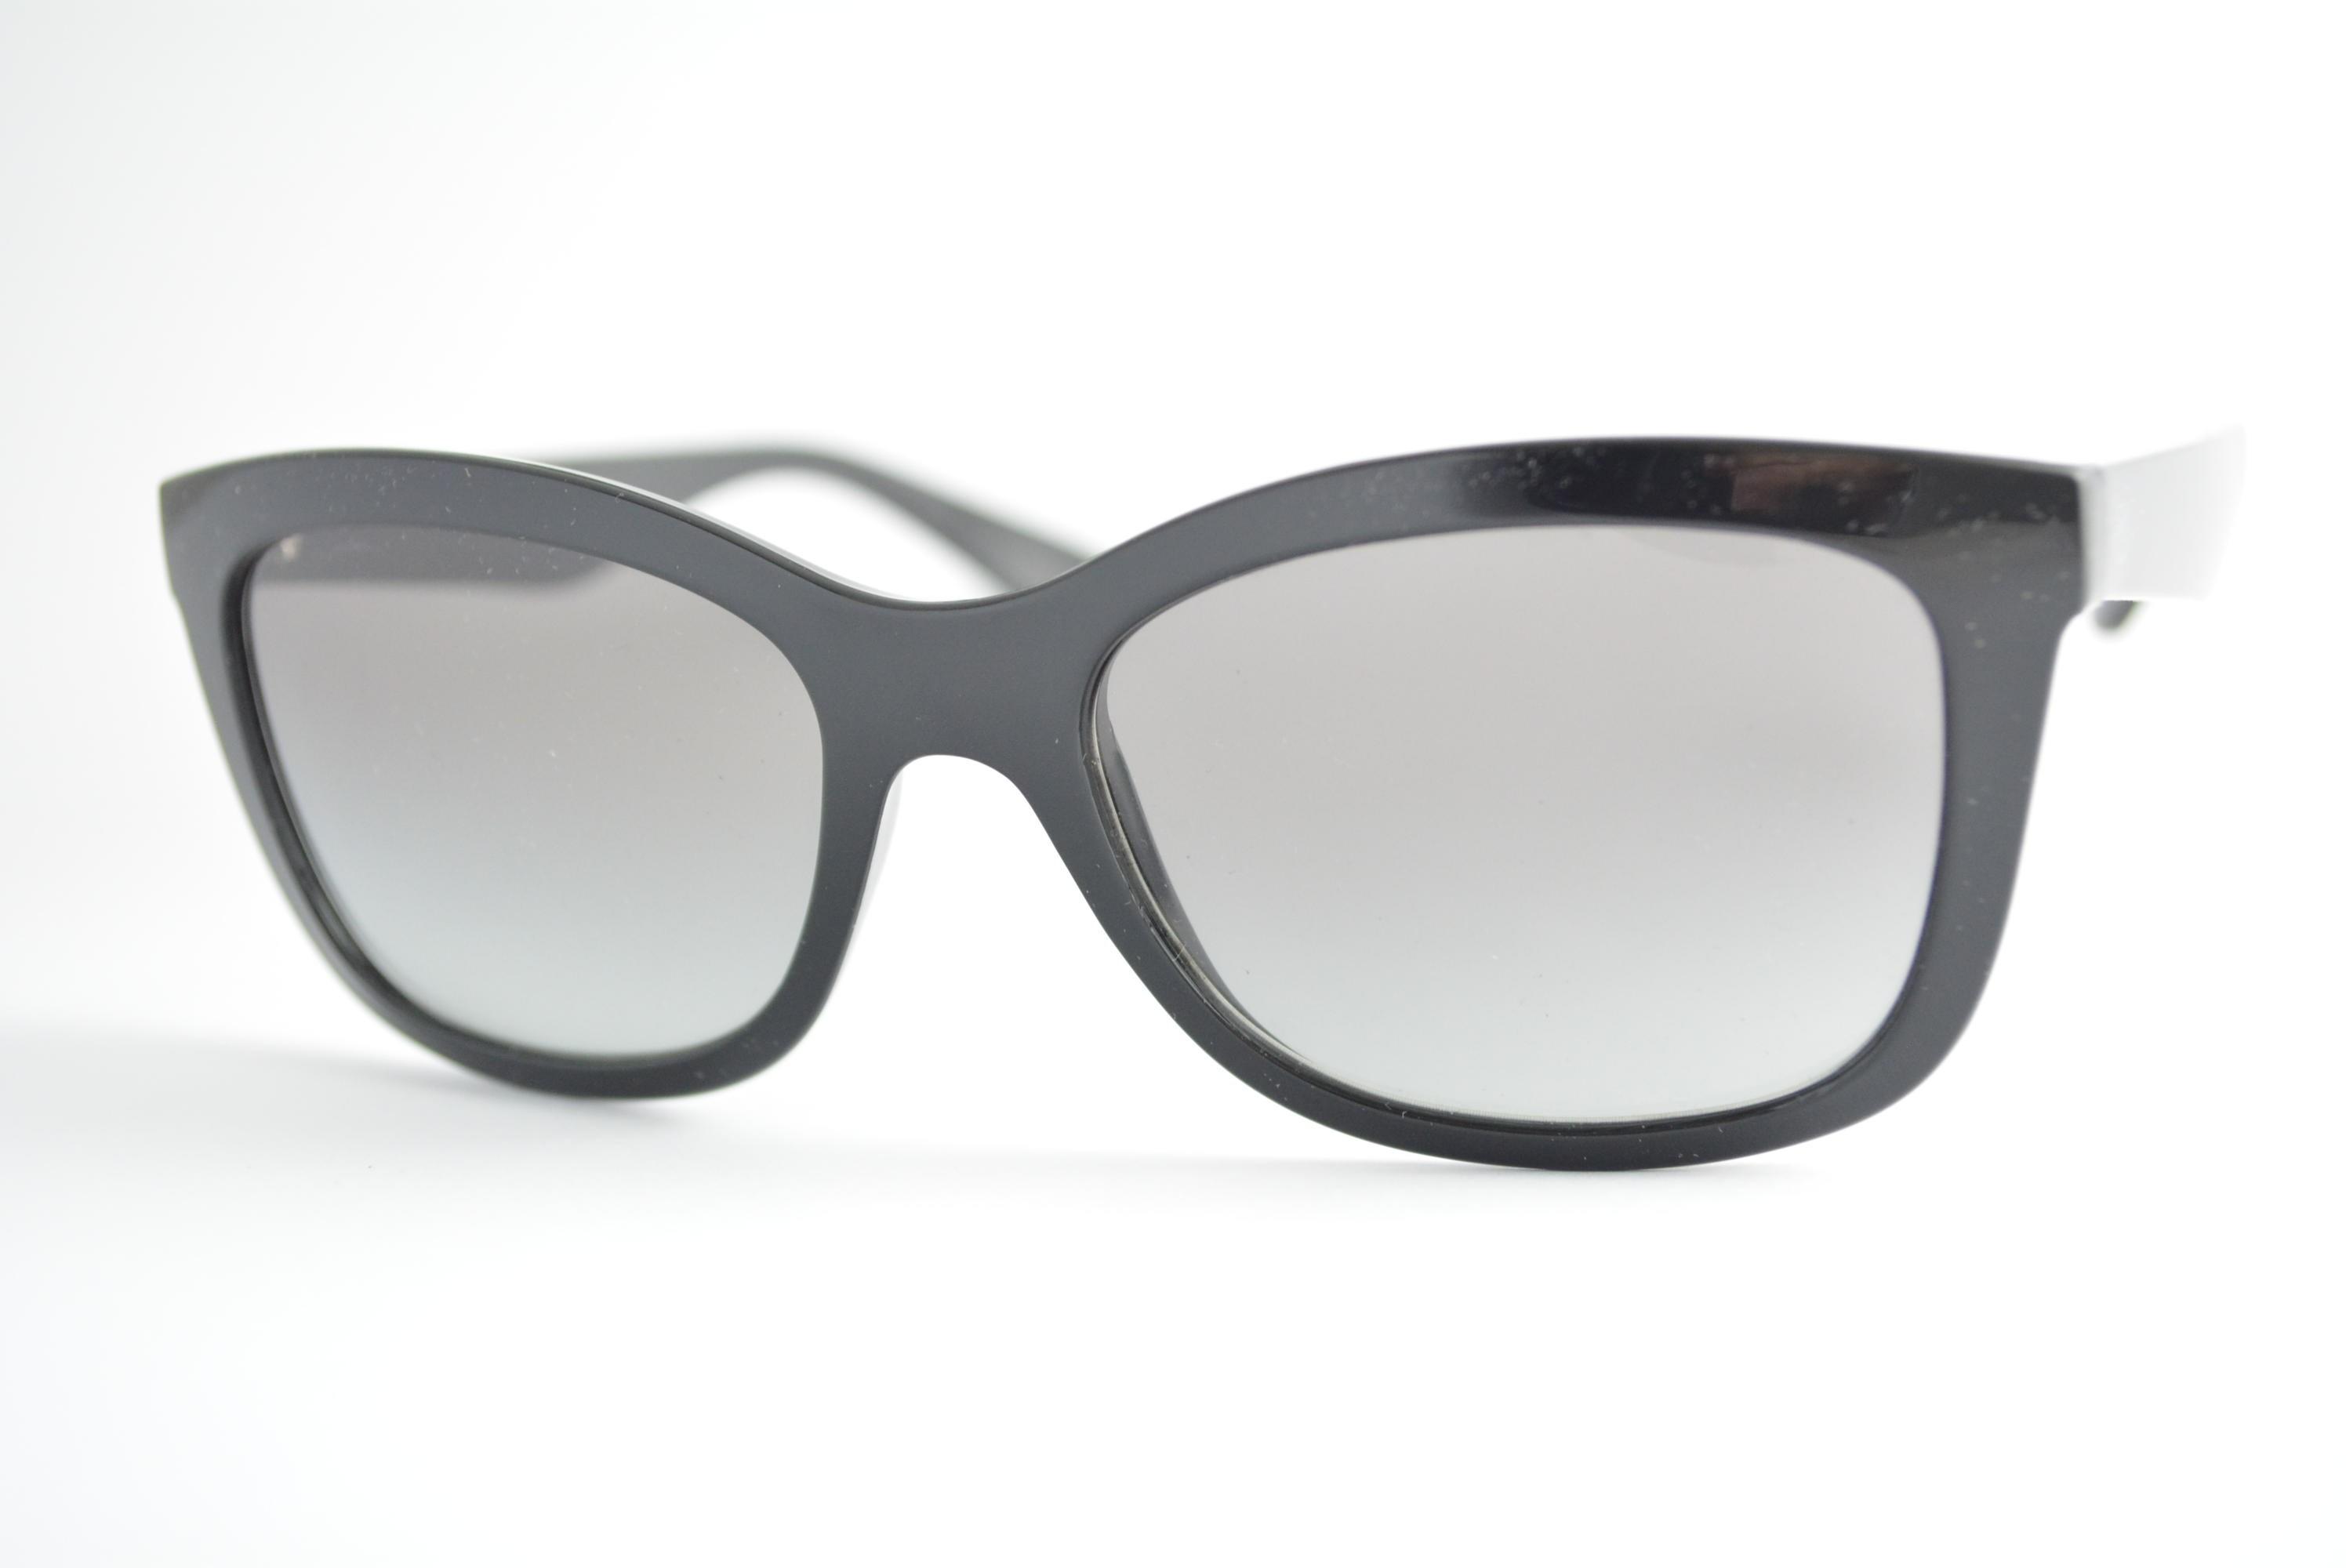 óculos de sol Tecnol mod tn4002 d553 Ótica Cardoso 6549302b58